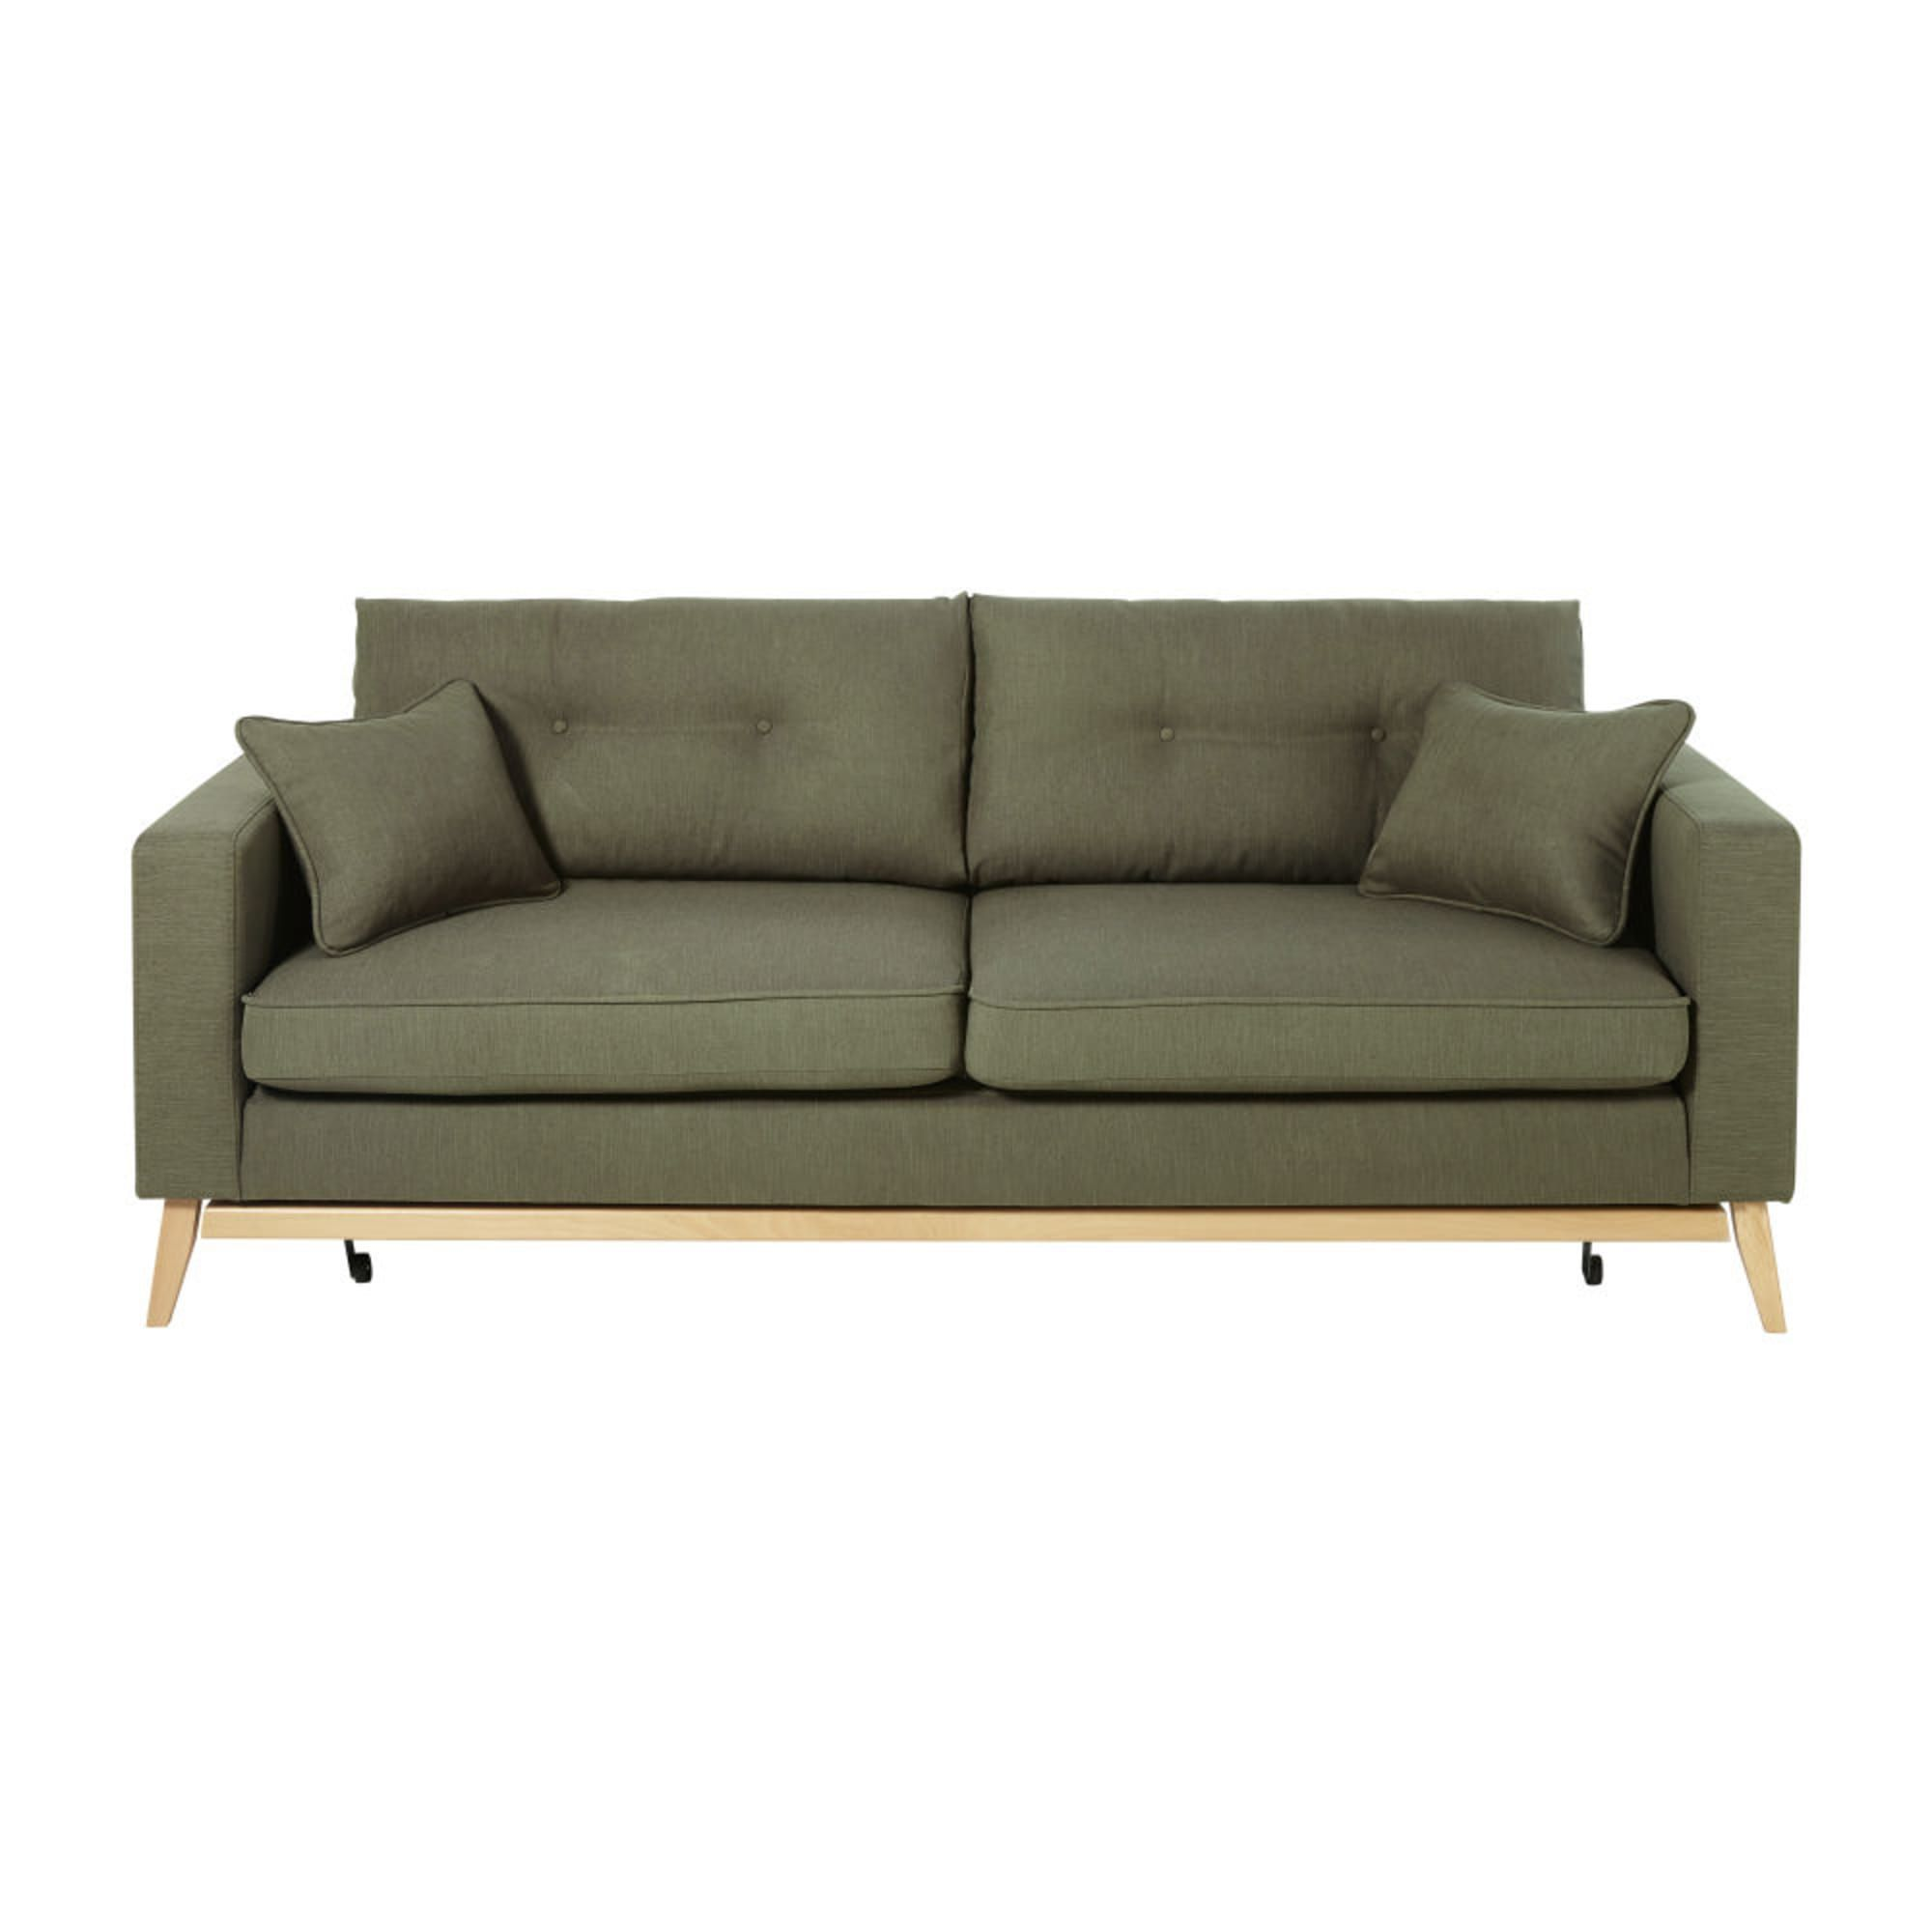 3 Sitzer Schlafsofa Im Skandinavischen Stil Kakigrun Sofa Sofa